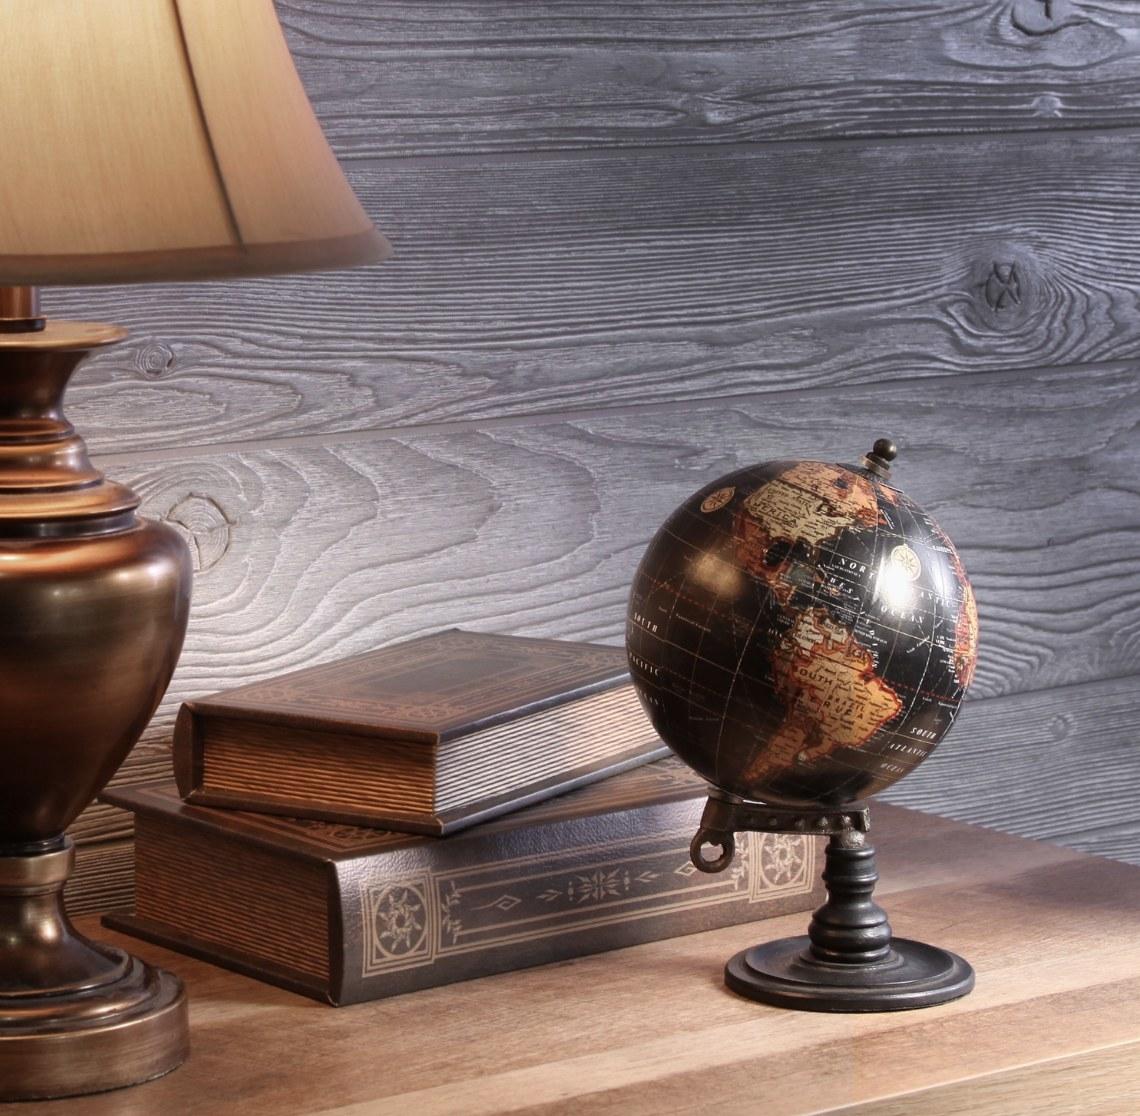 The predominantly black globe has neutral-toned land